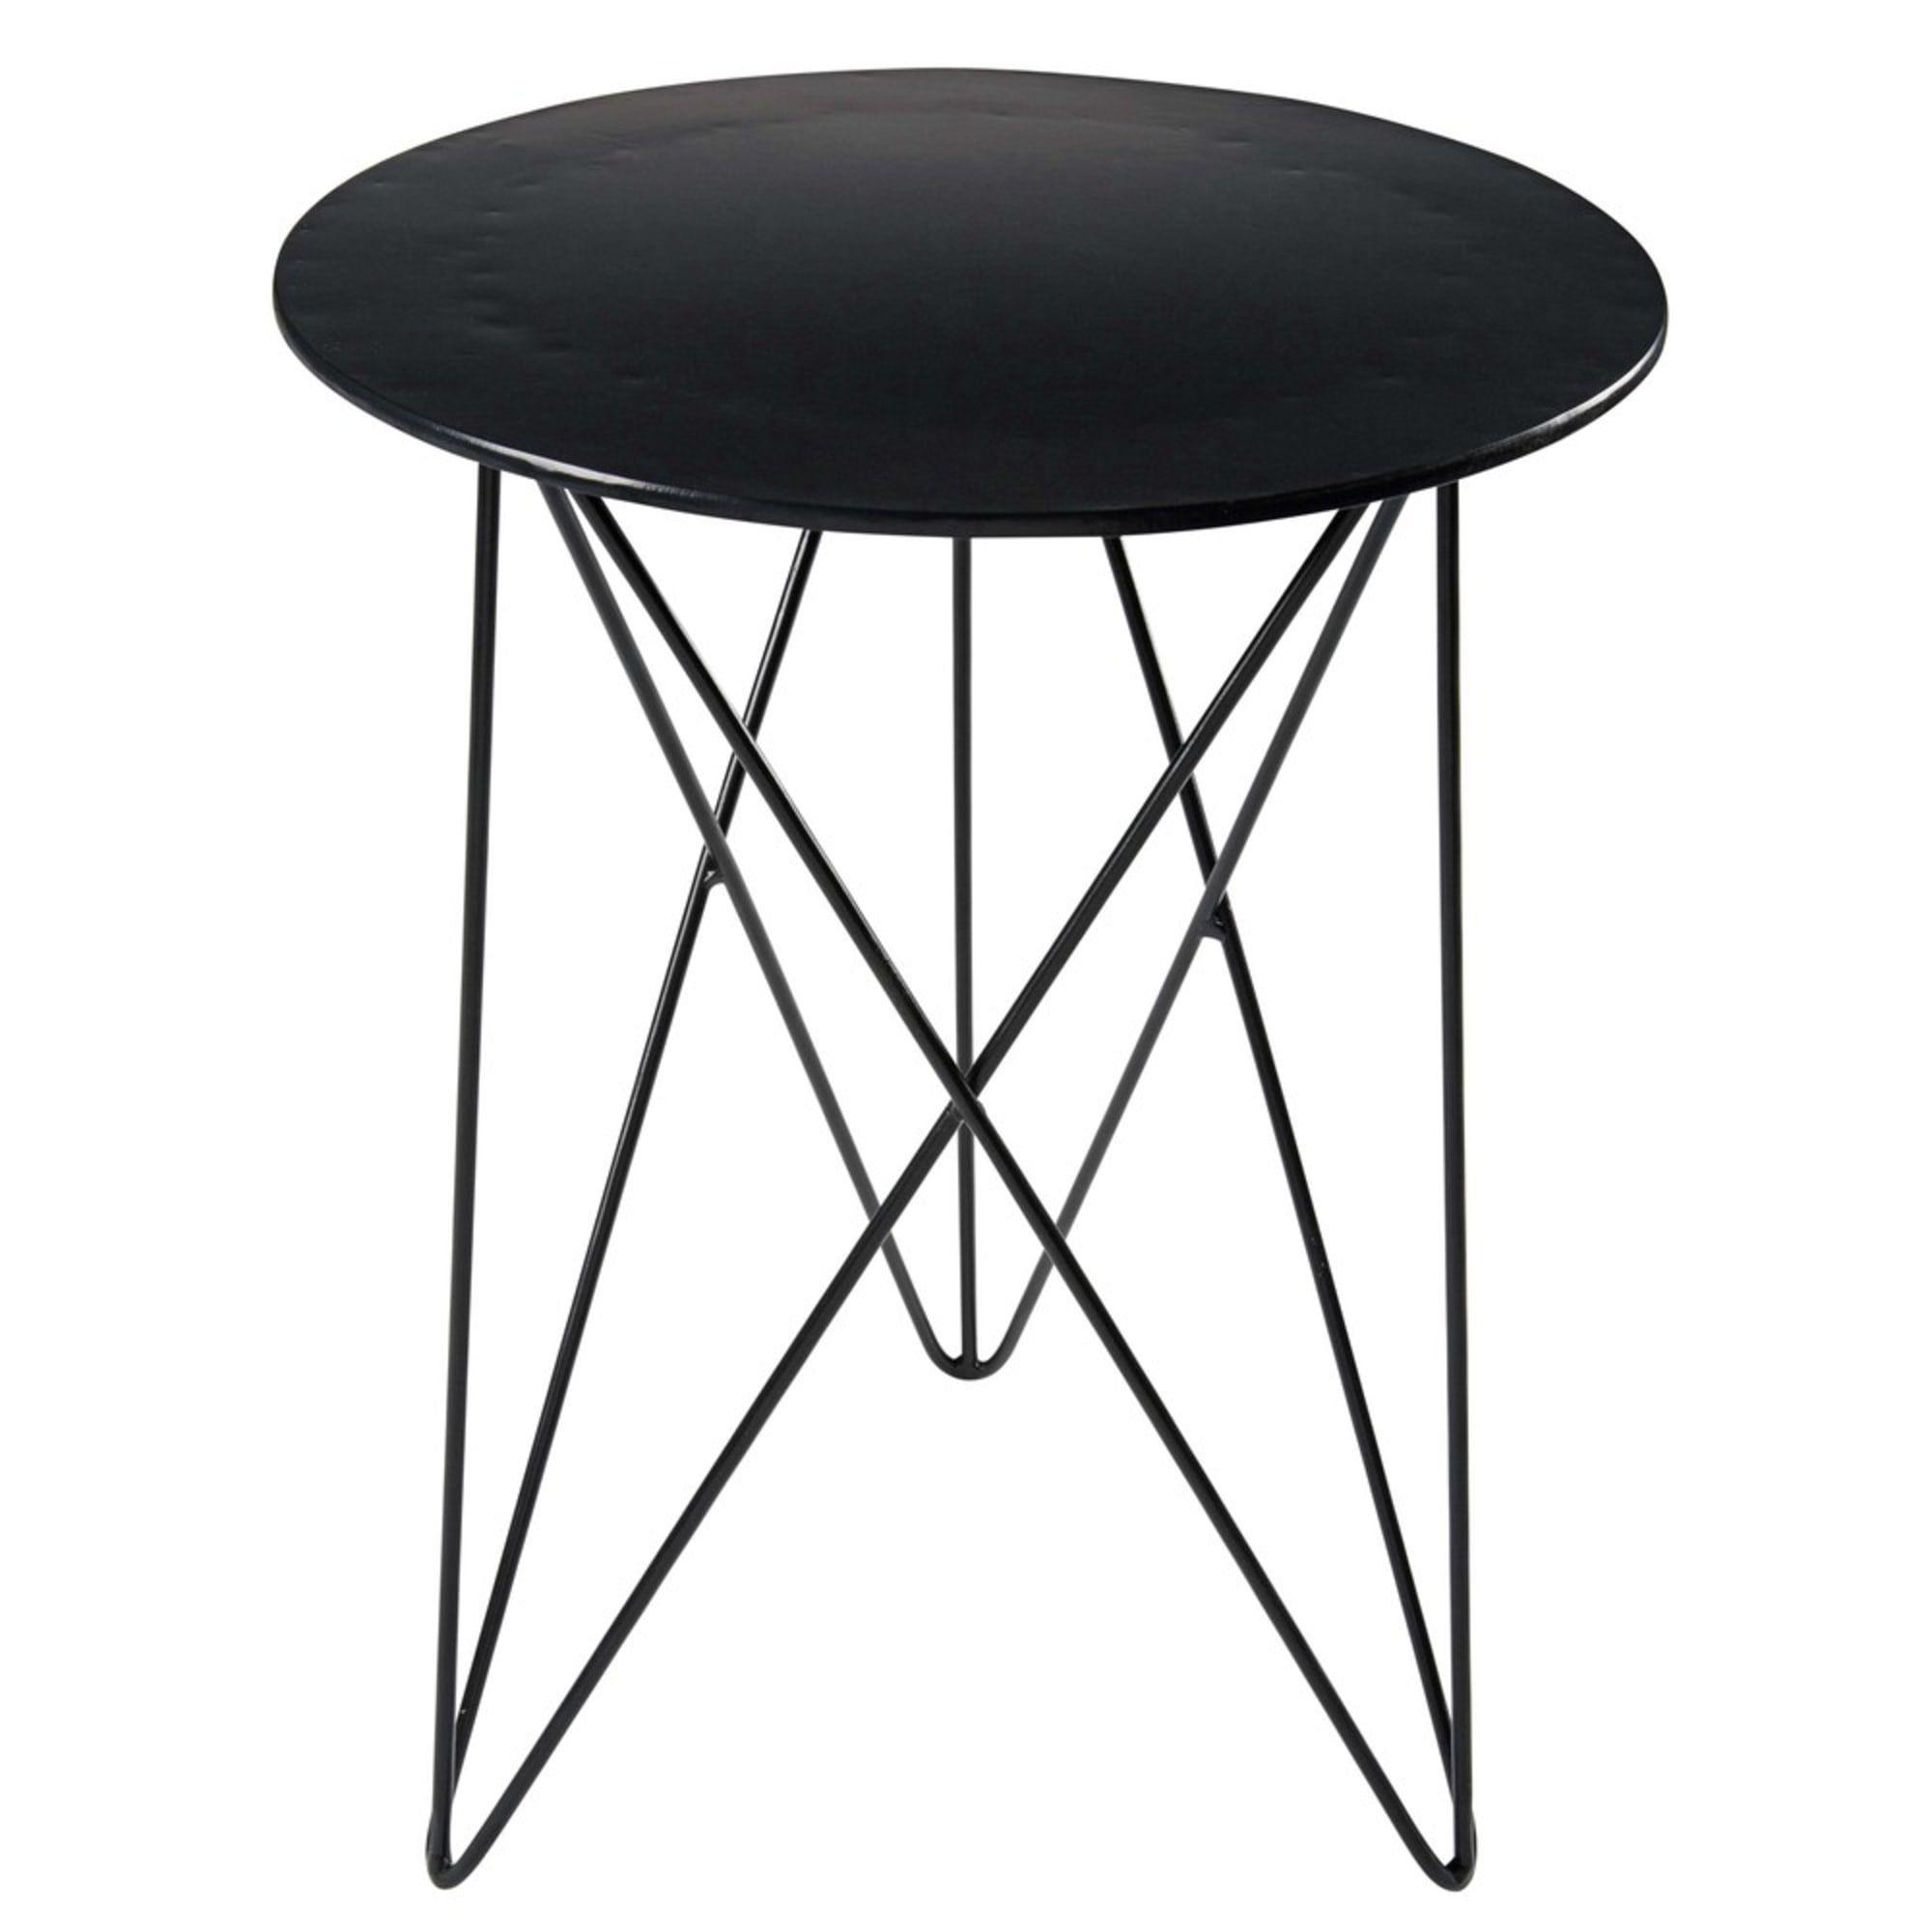 Beistelltisch Aus Schwarzem Metall Maisons Du Monde Black Metal Bedside Table Metal Side Table Small Black Table [ 2000 x 2000 Pixel ]